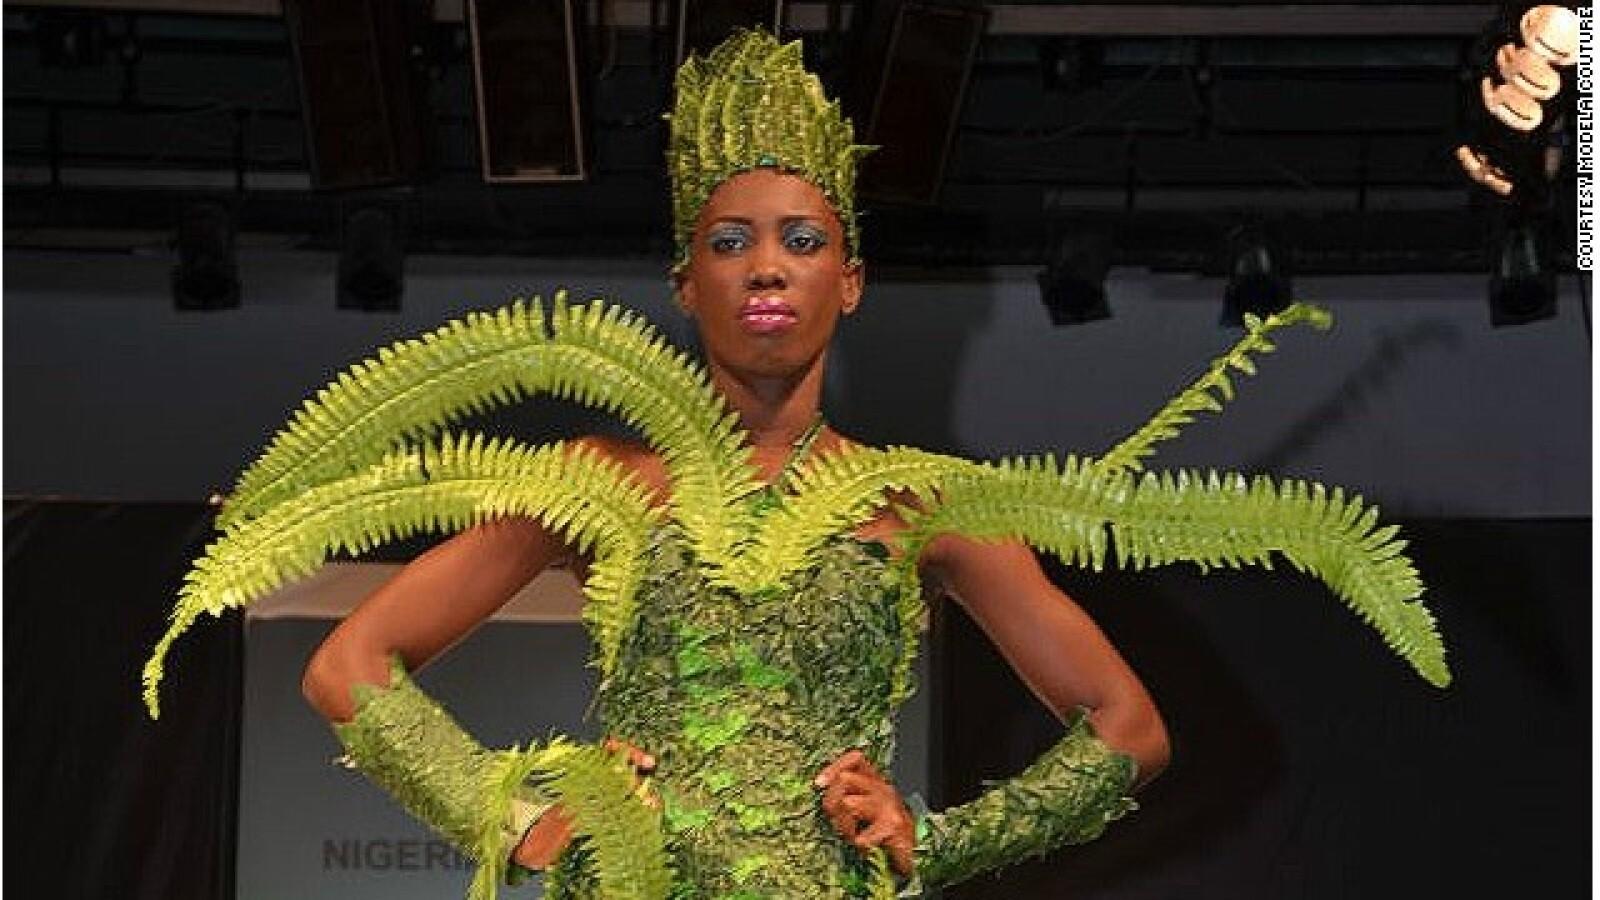 semana de la moda en Nigeria